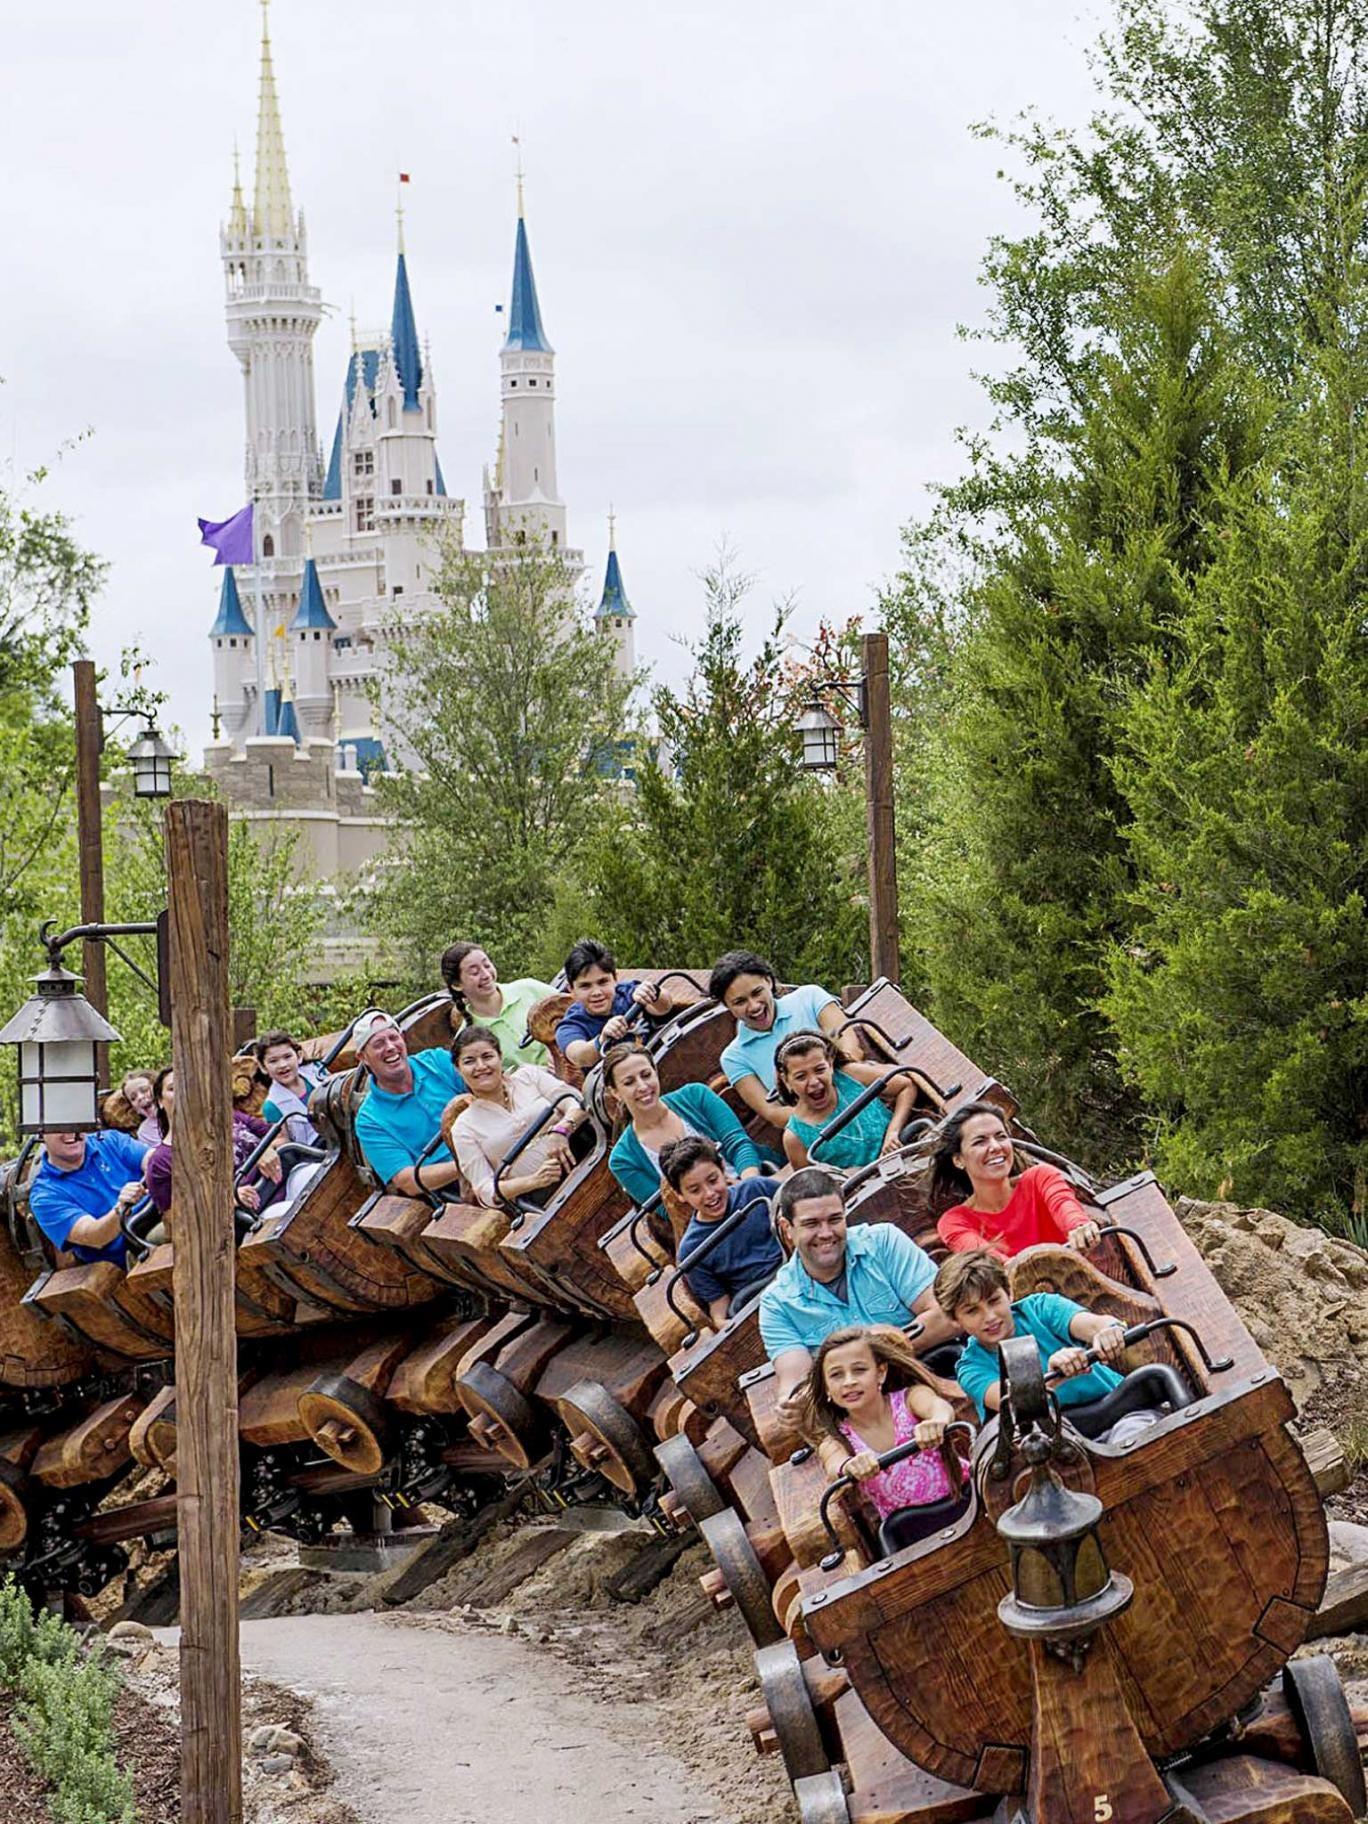 Orlando: Hi ho, off we go: the Seven Dwarfs Mine Train